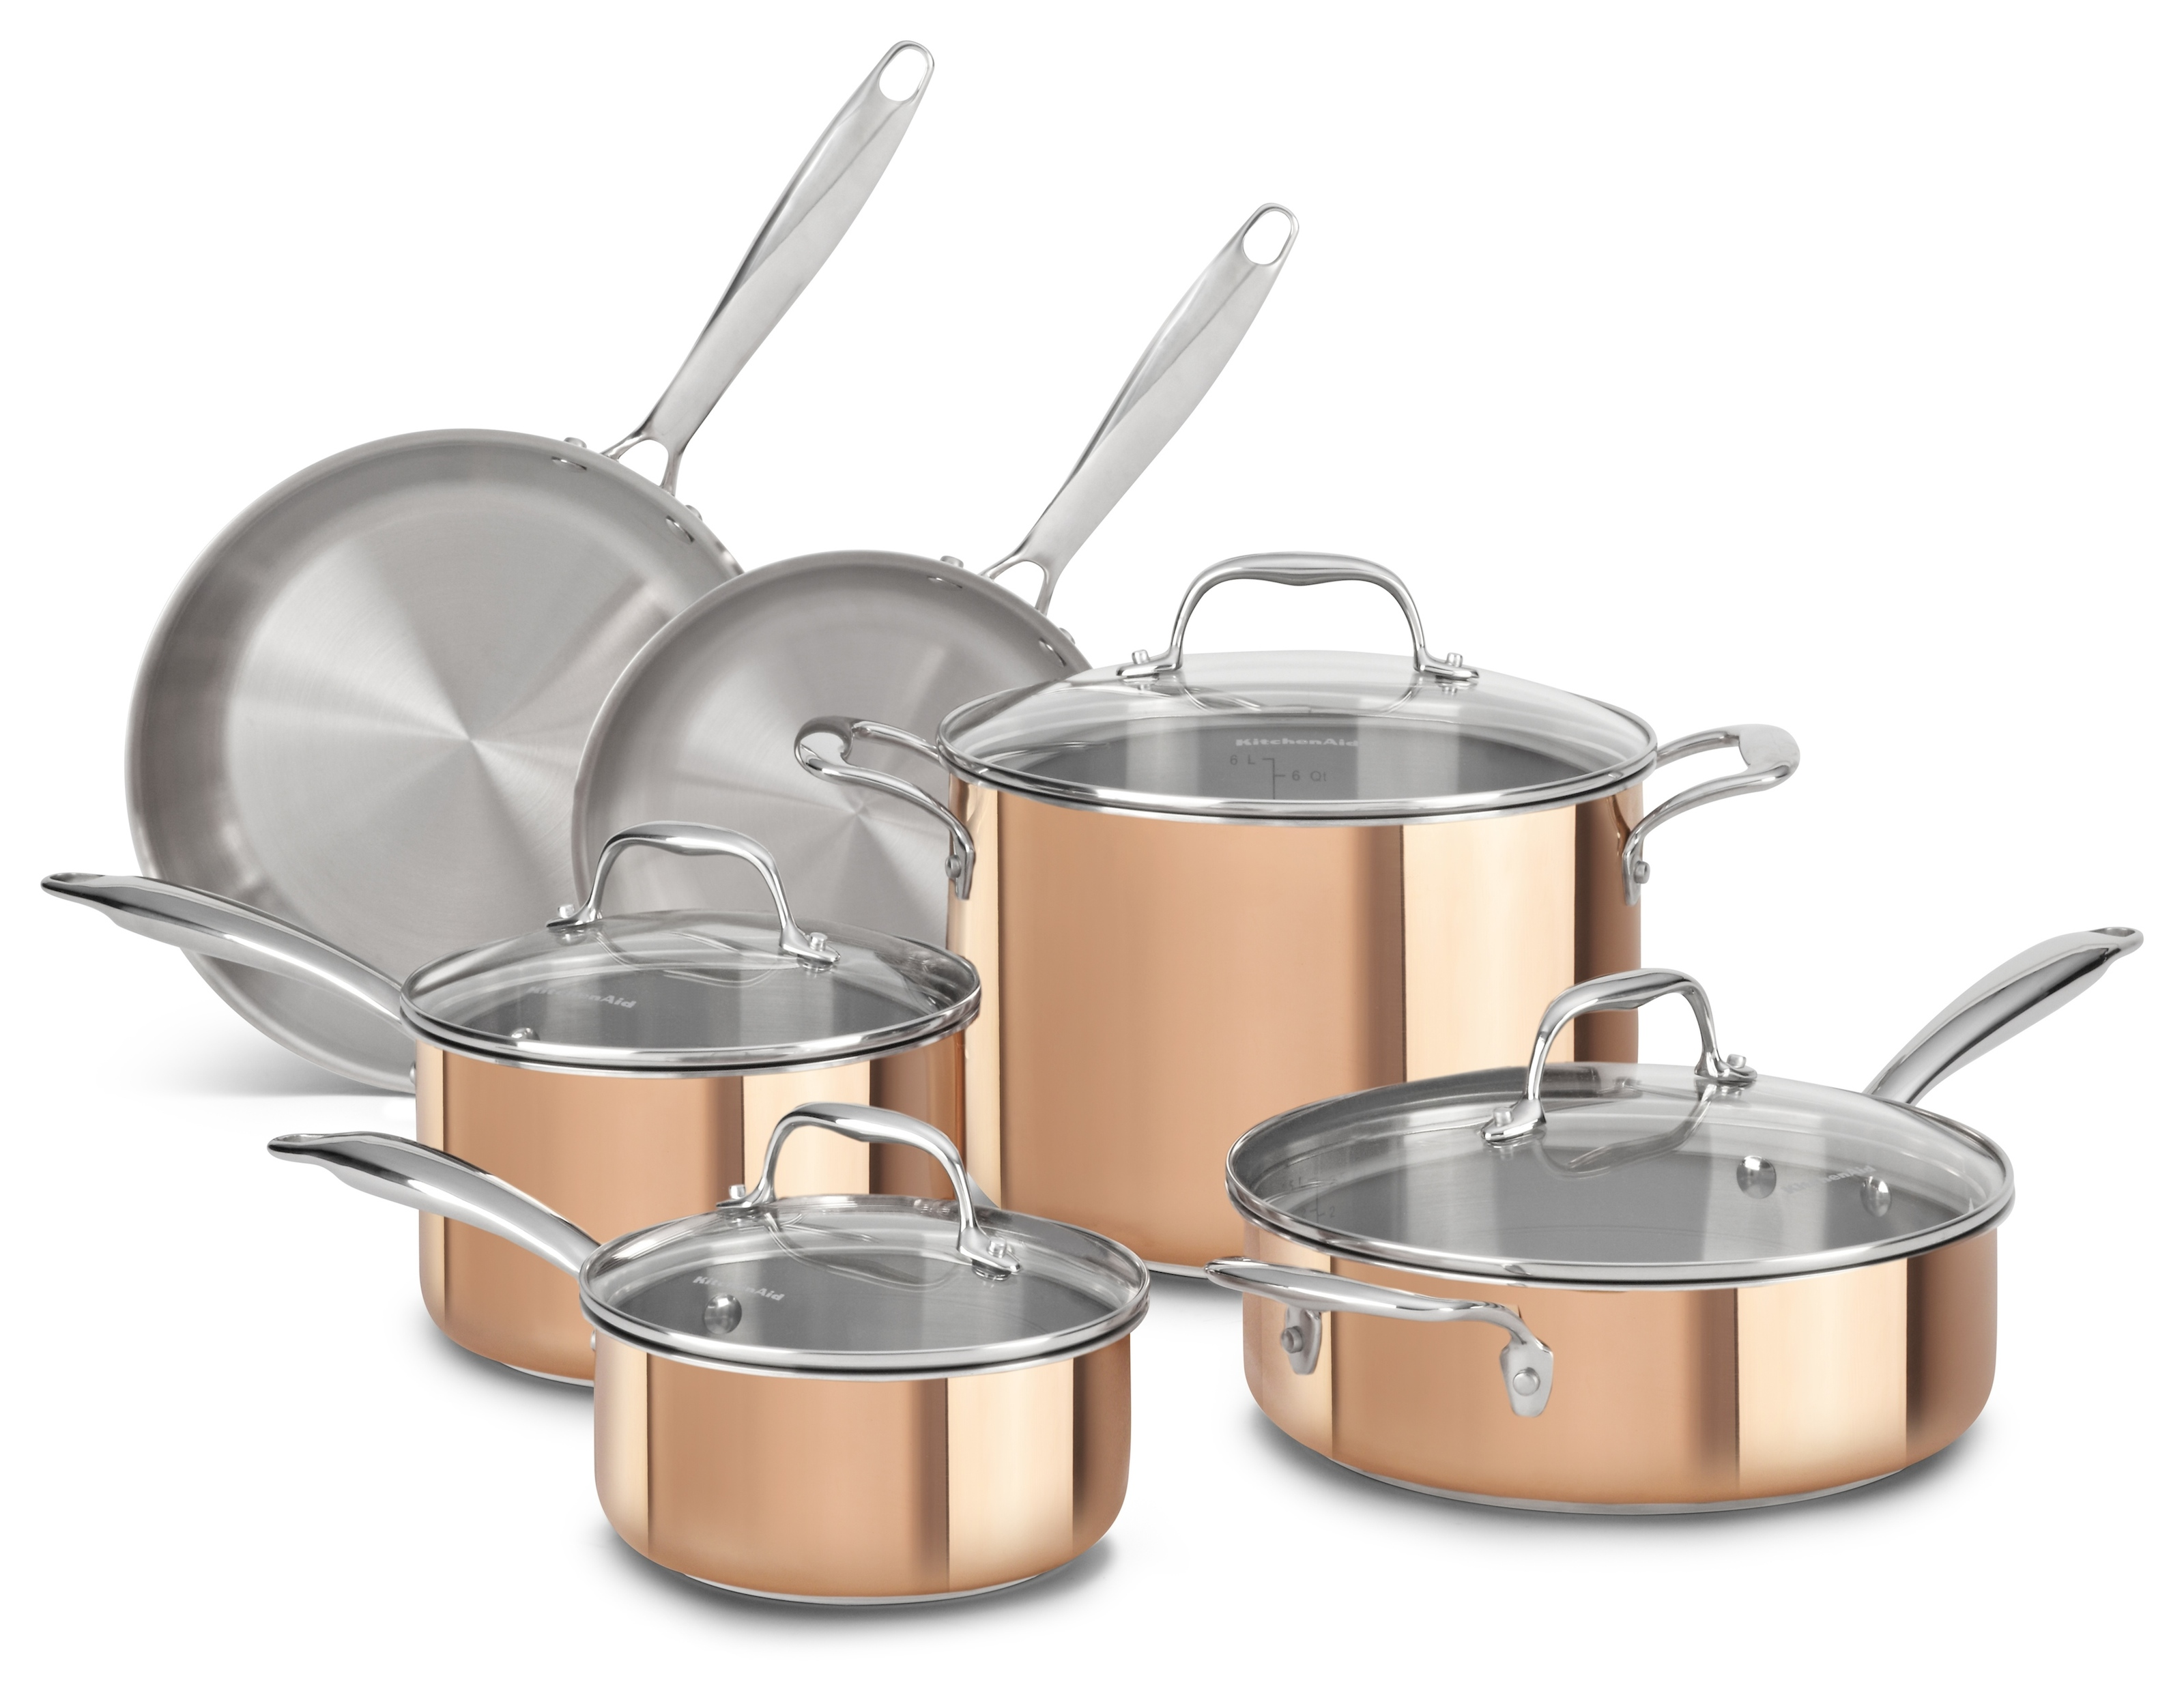 KitchenAid Copper CLAD Tri-Ply 10-Piece Cookware Set, MRP $1,299 (1)